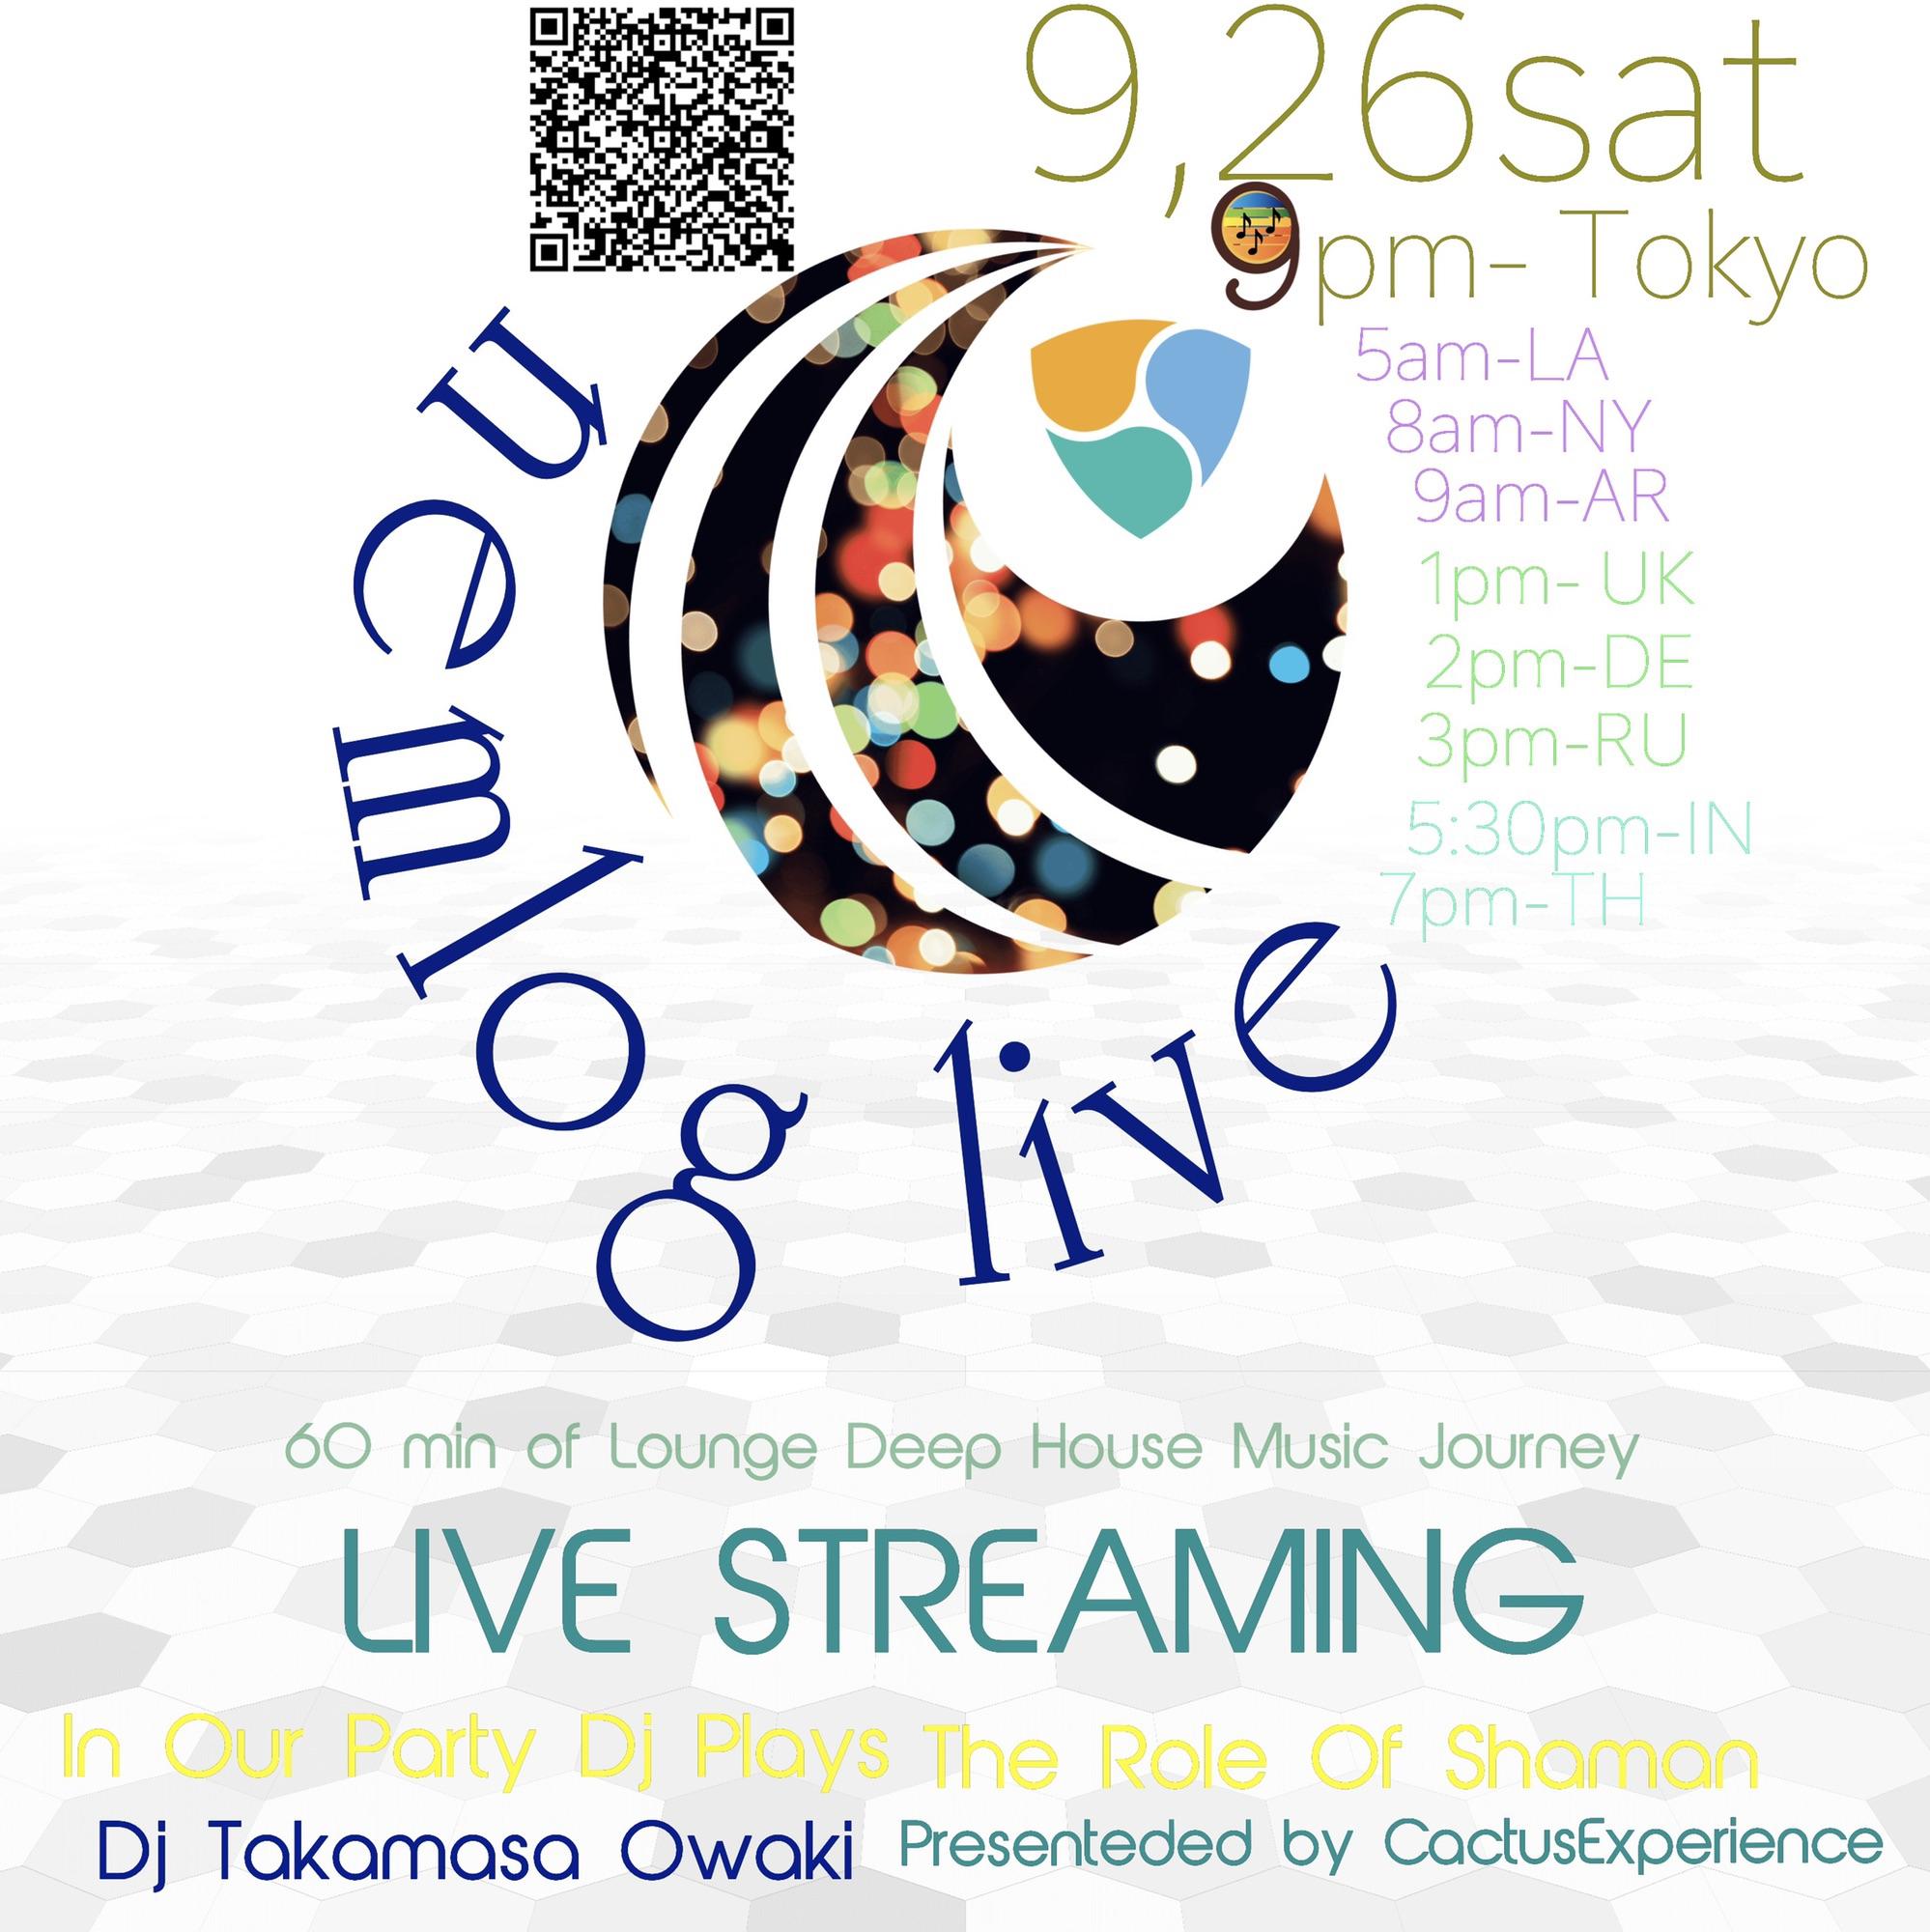 活動報告&次回予告 nemlog LIVE STREAM 9/26(sat)9pm JST DJ Takamasa Owaki